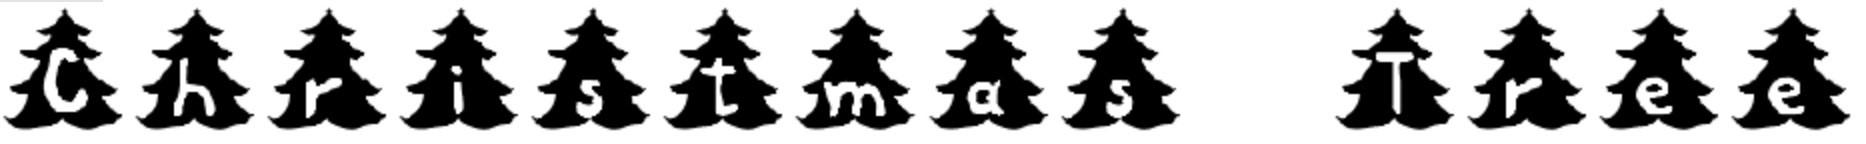 Christamas tree font.jpg